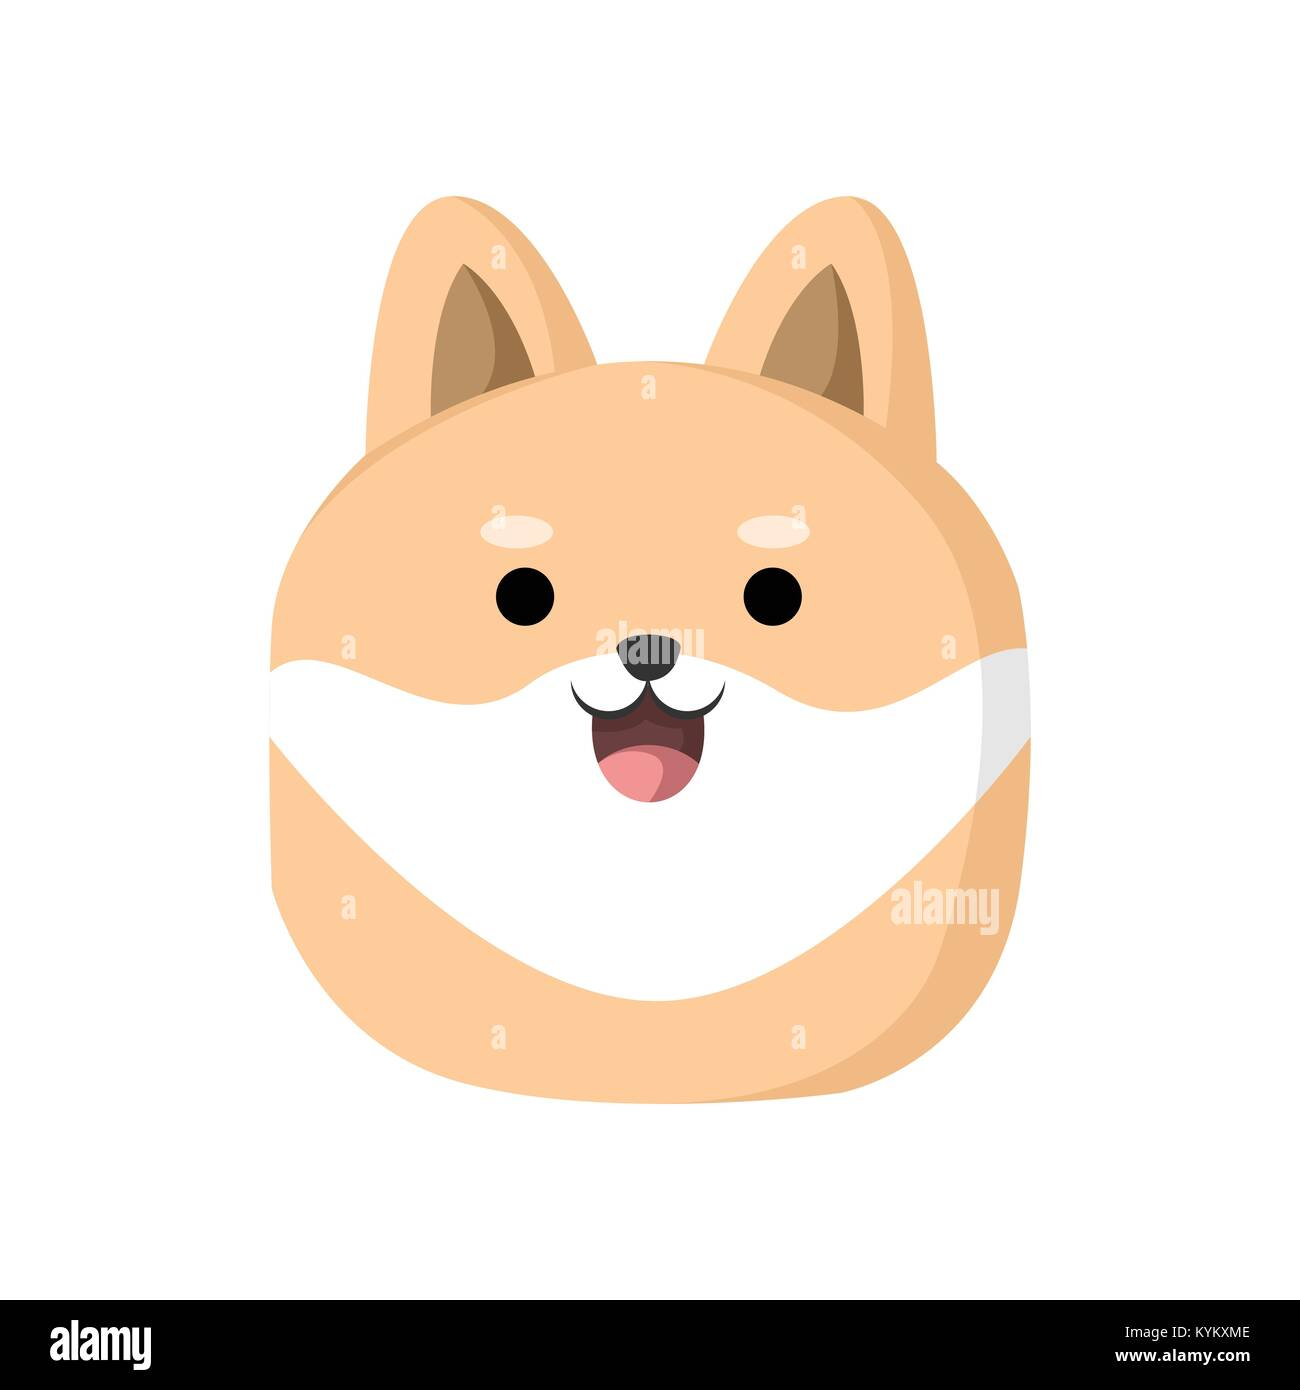 dd6811a45 Cute Dog Cartoon Character Vector Illustration Graphic Design Stock ...